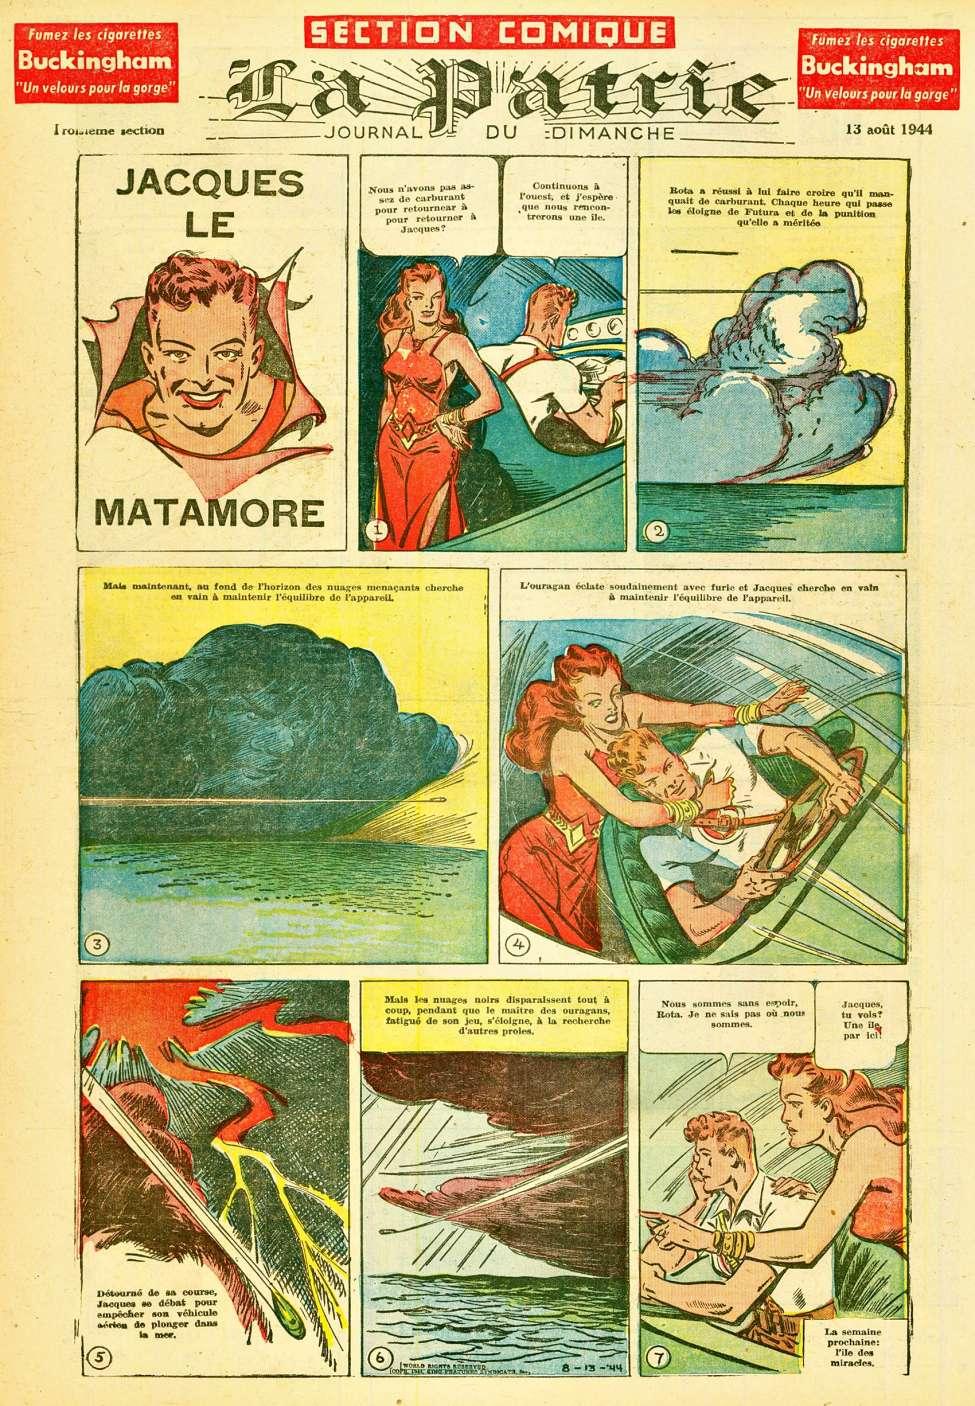 Comic Book Cover For La Patrie - Section Comique (1944-08-13)